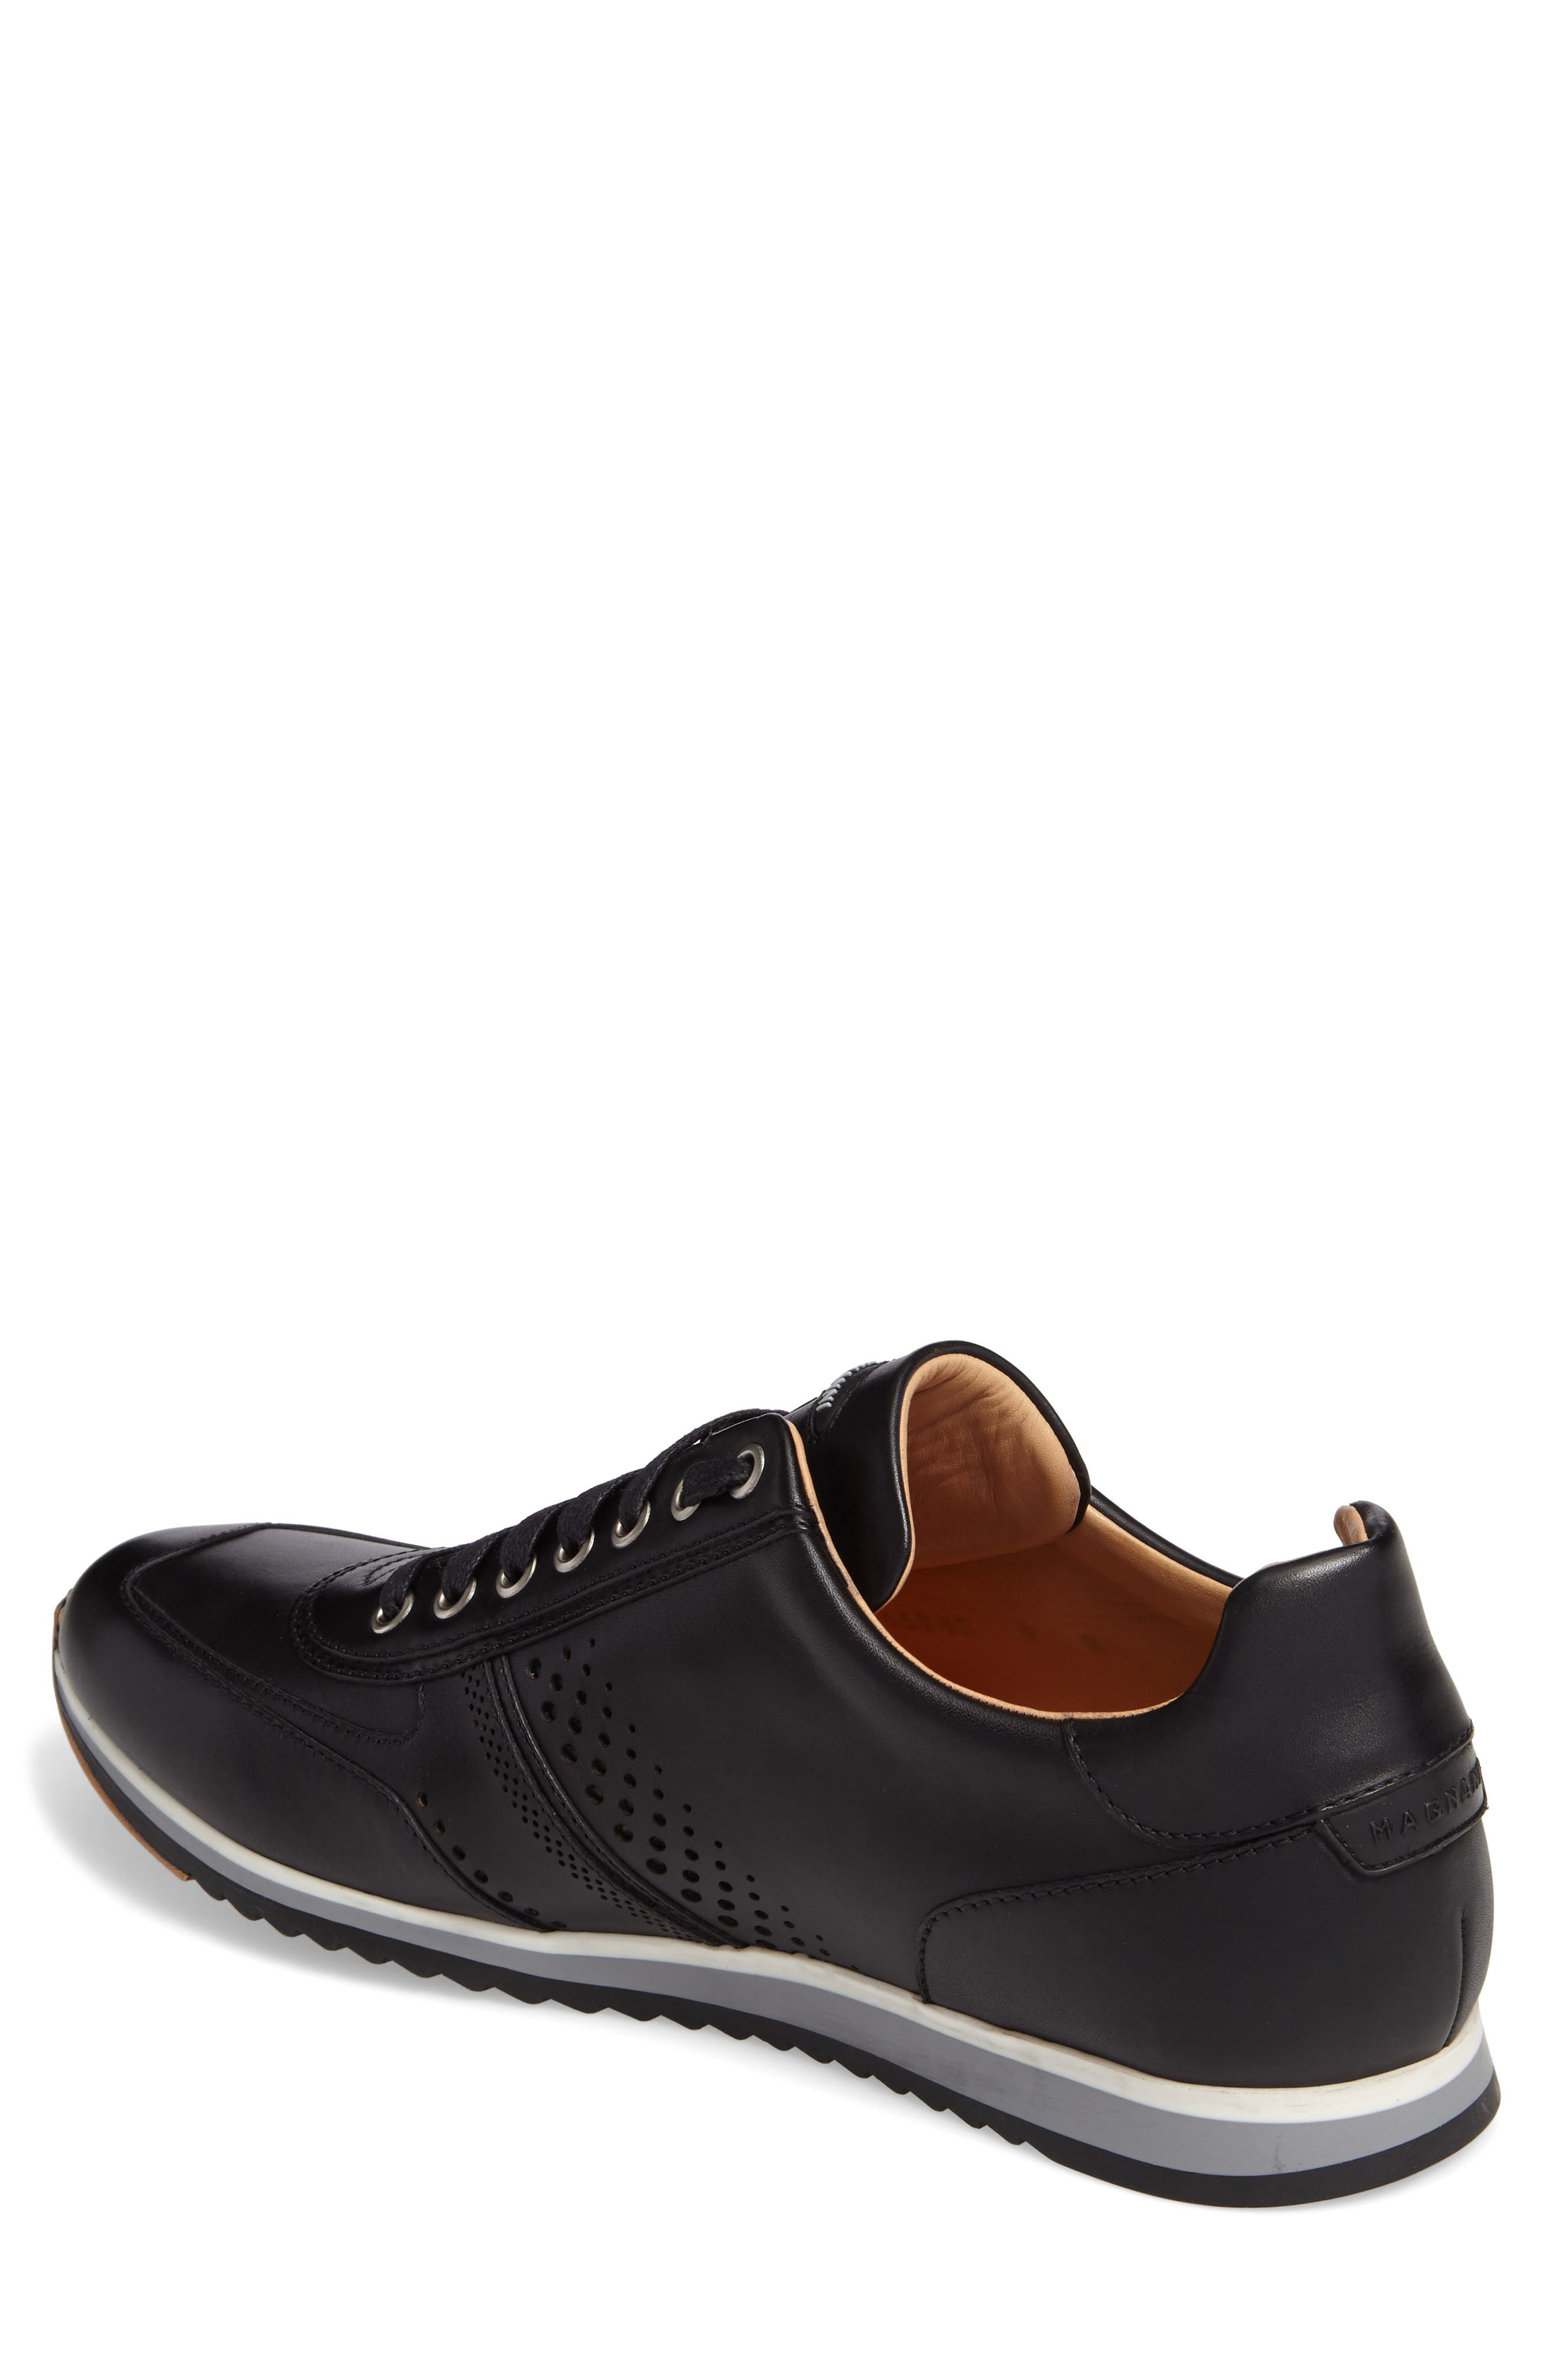 Alternate Image 2  - Magnanni 'Cristian' Sneaker (Men)